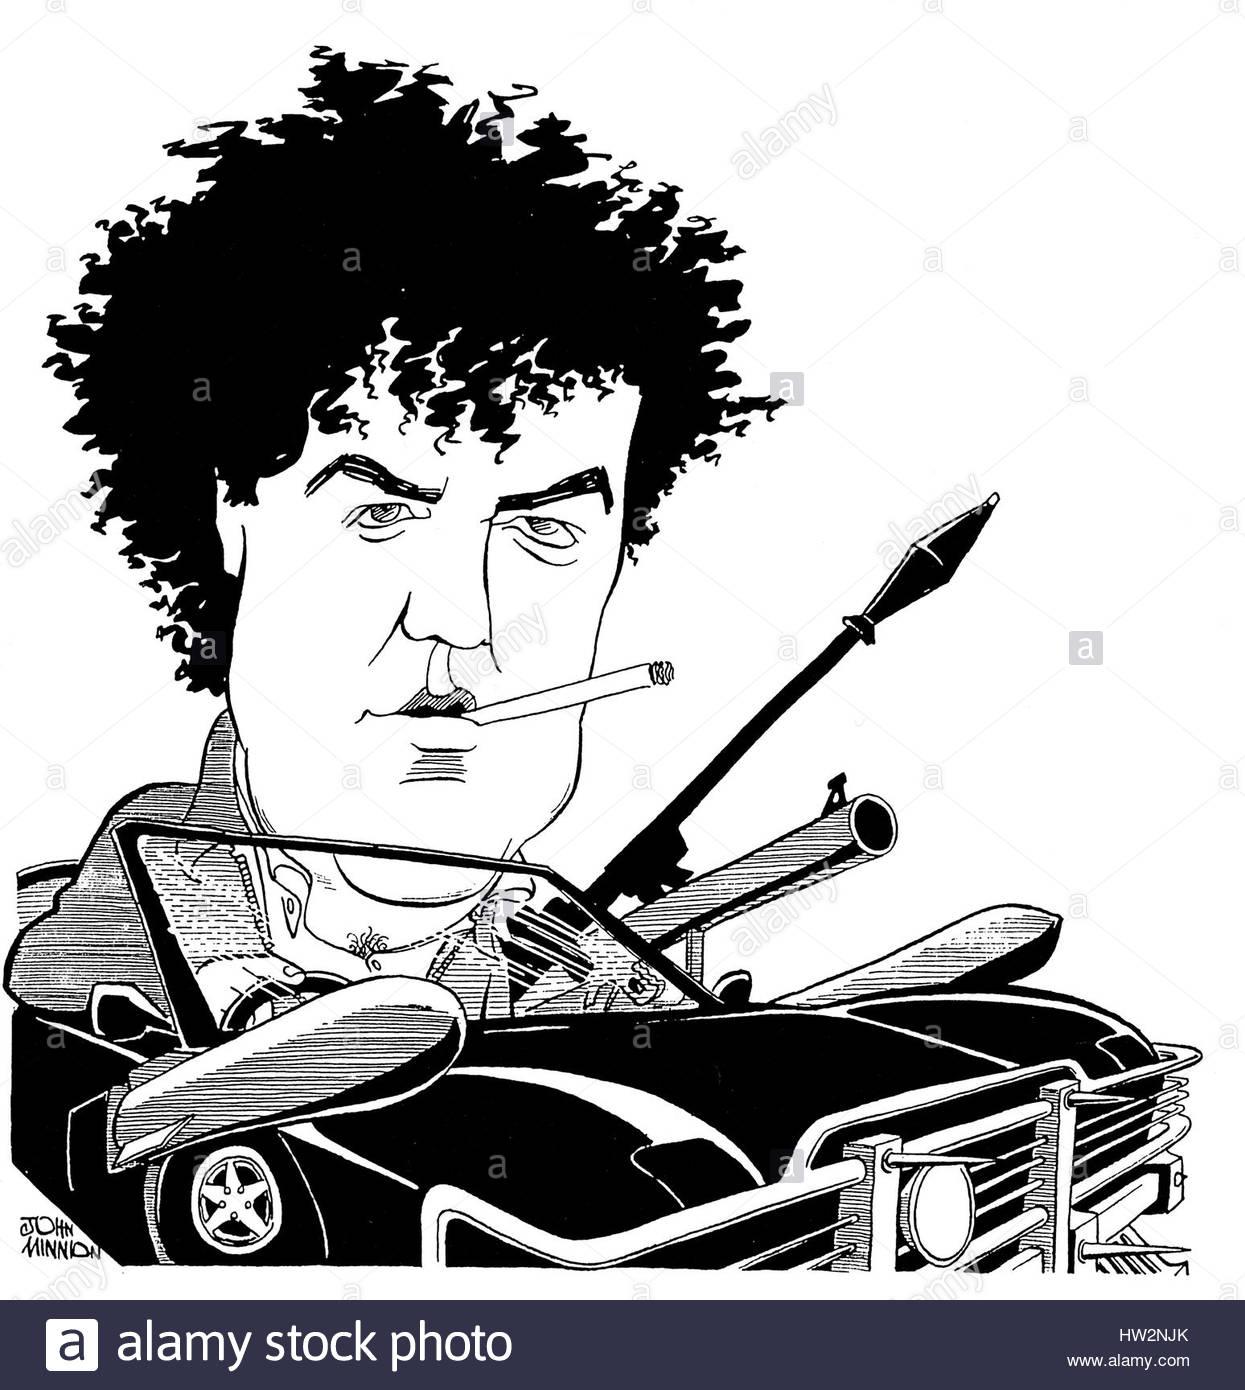 Cigarette Caricature jeremy clarkson, caricaturejohn minnion. jeremy clarkson drives